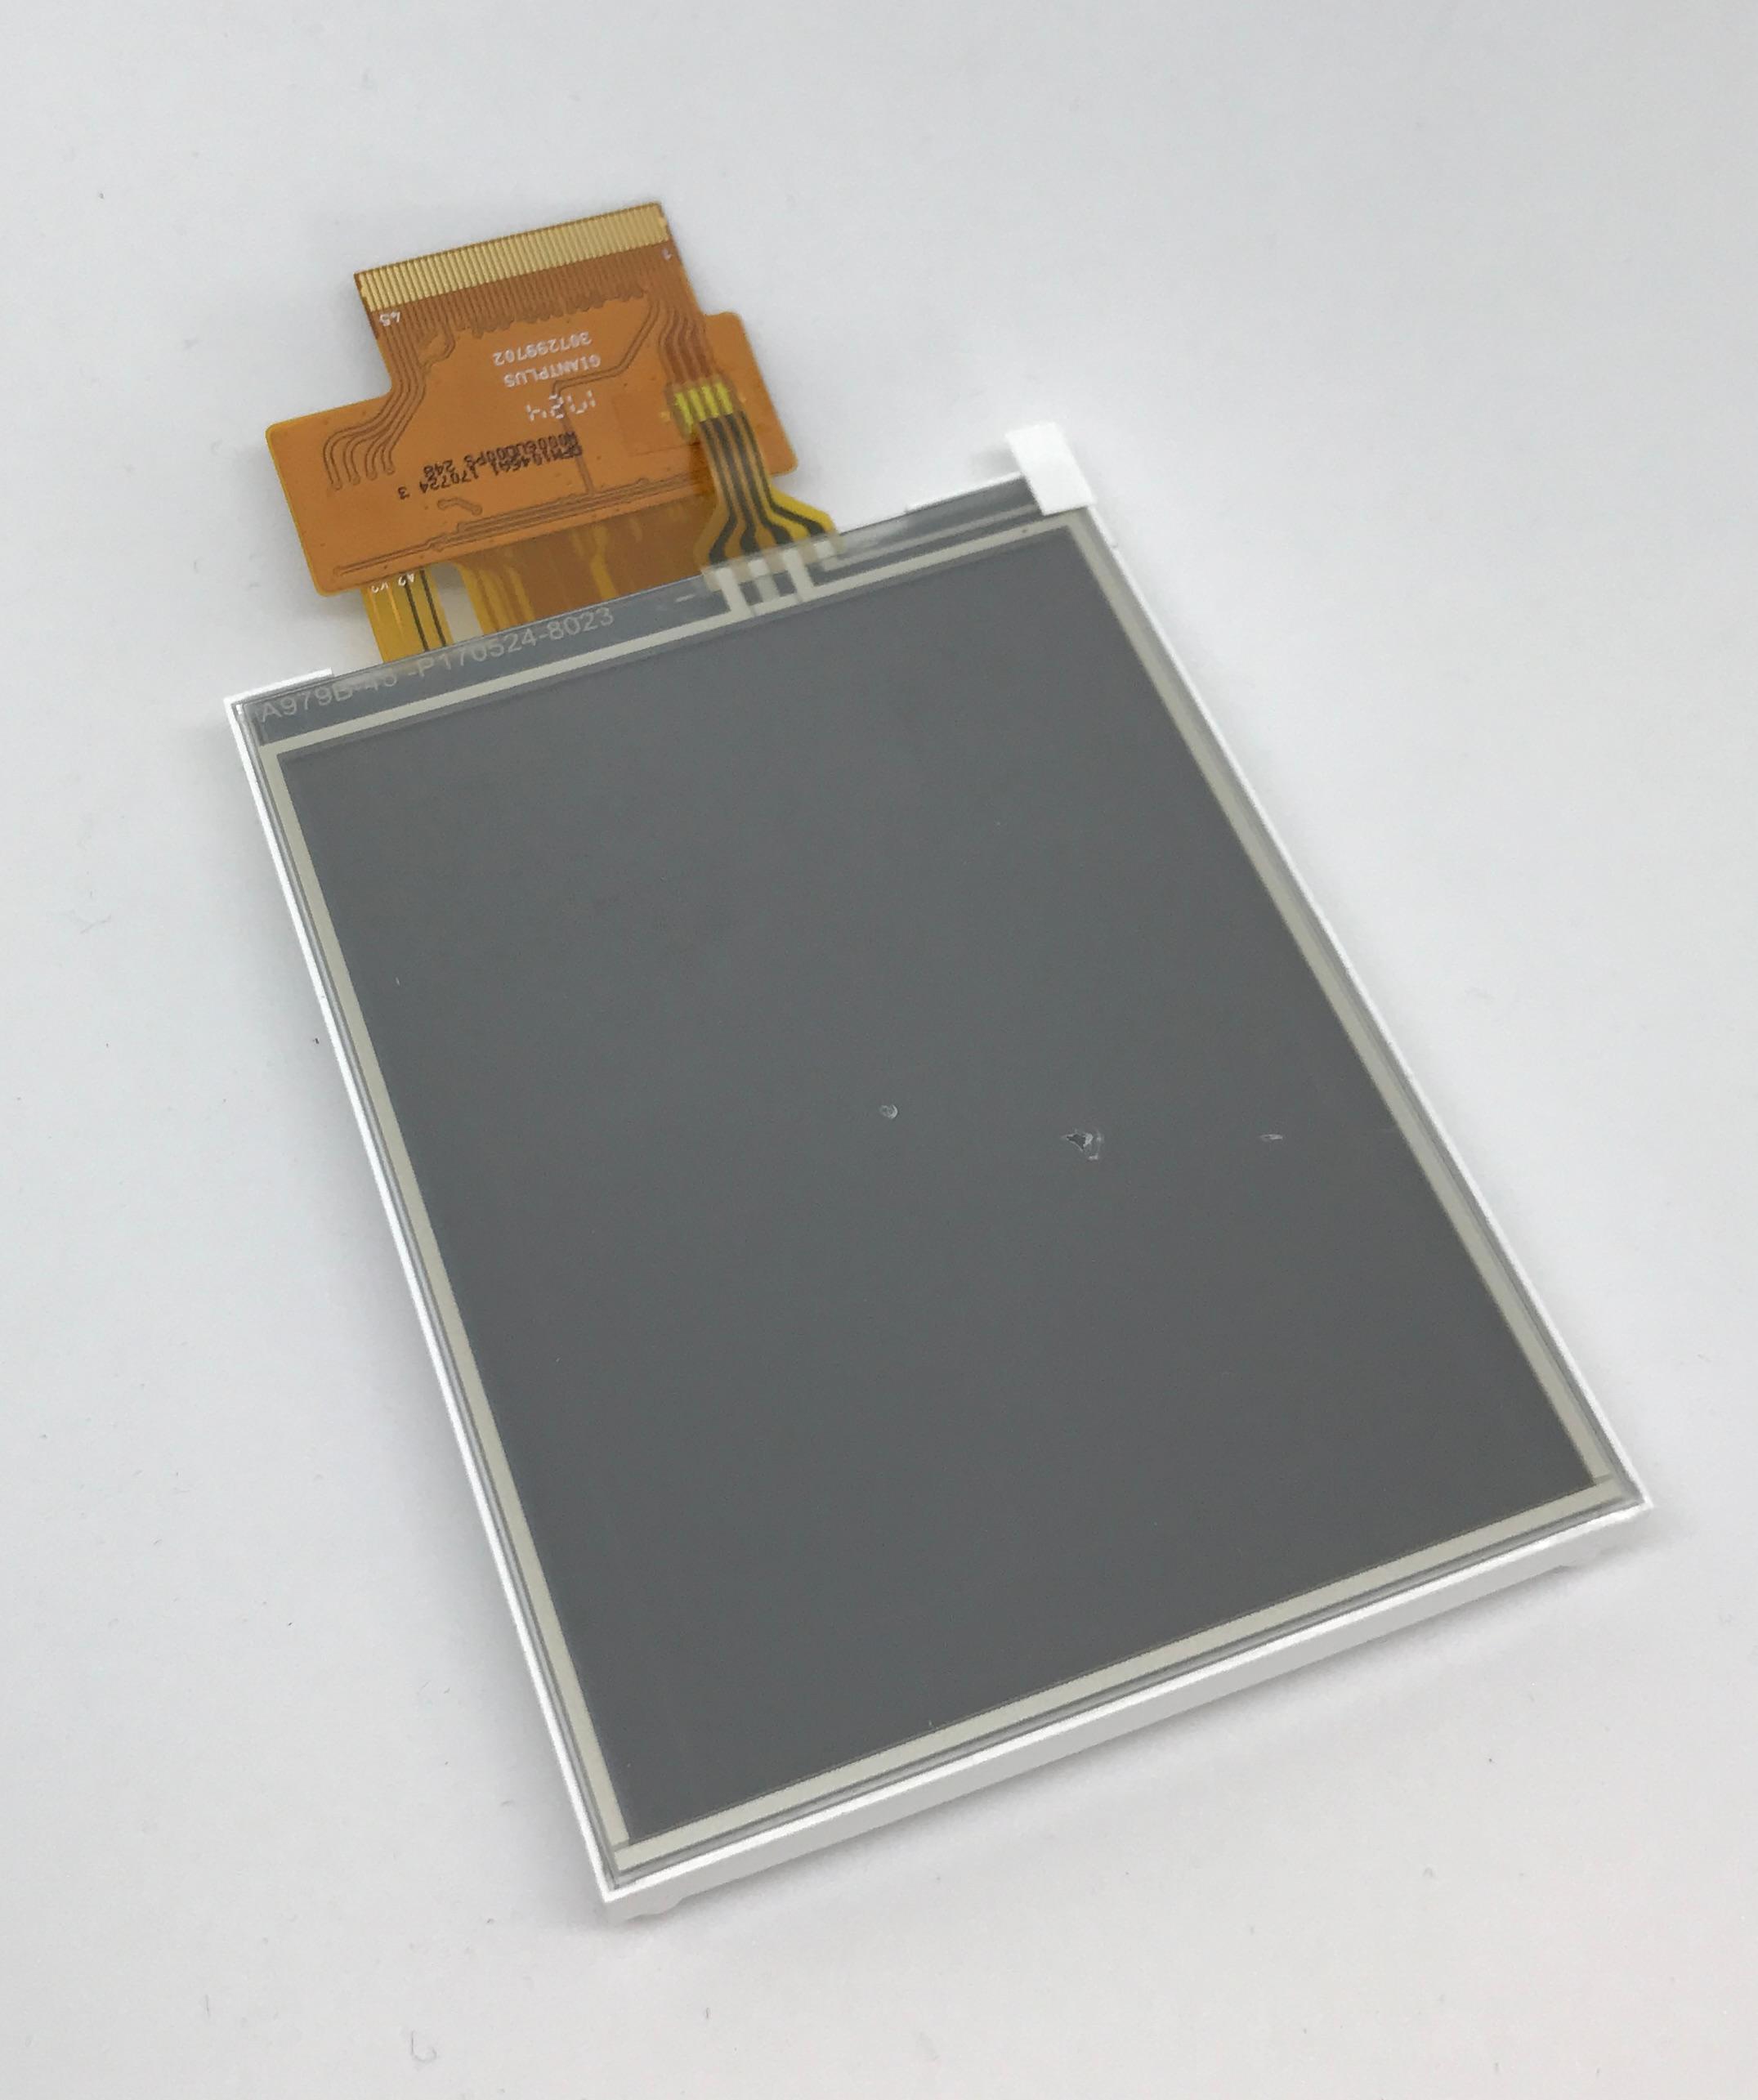 LCM268-001-01-B.JPG